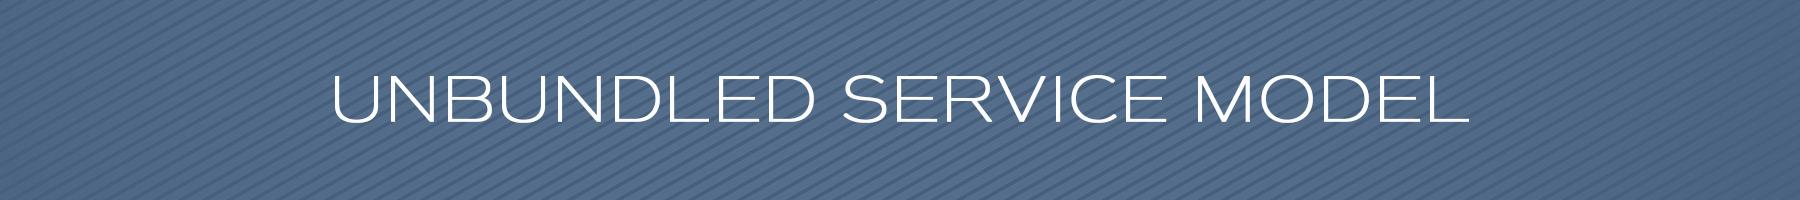 headers_unbundled service model.jpg